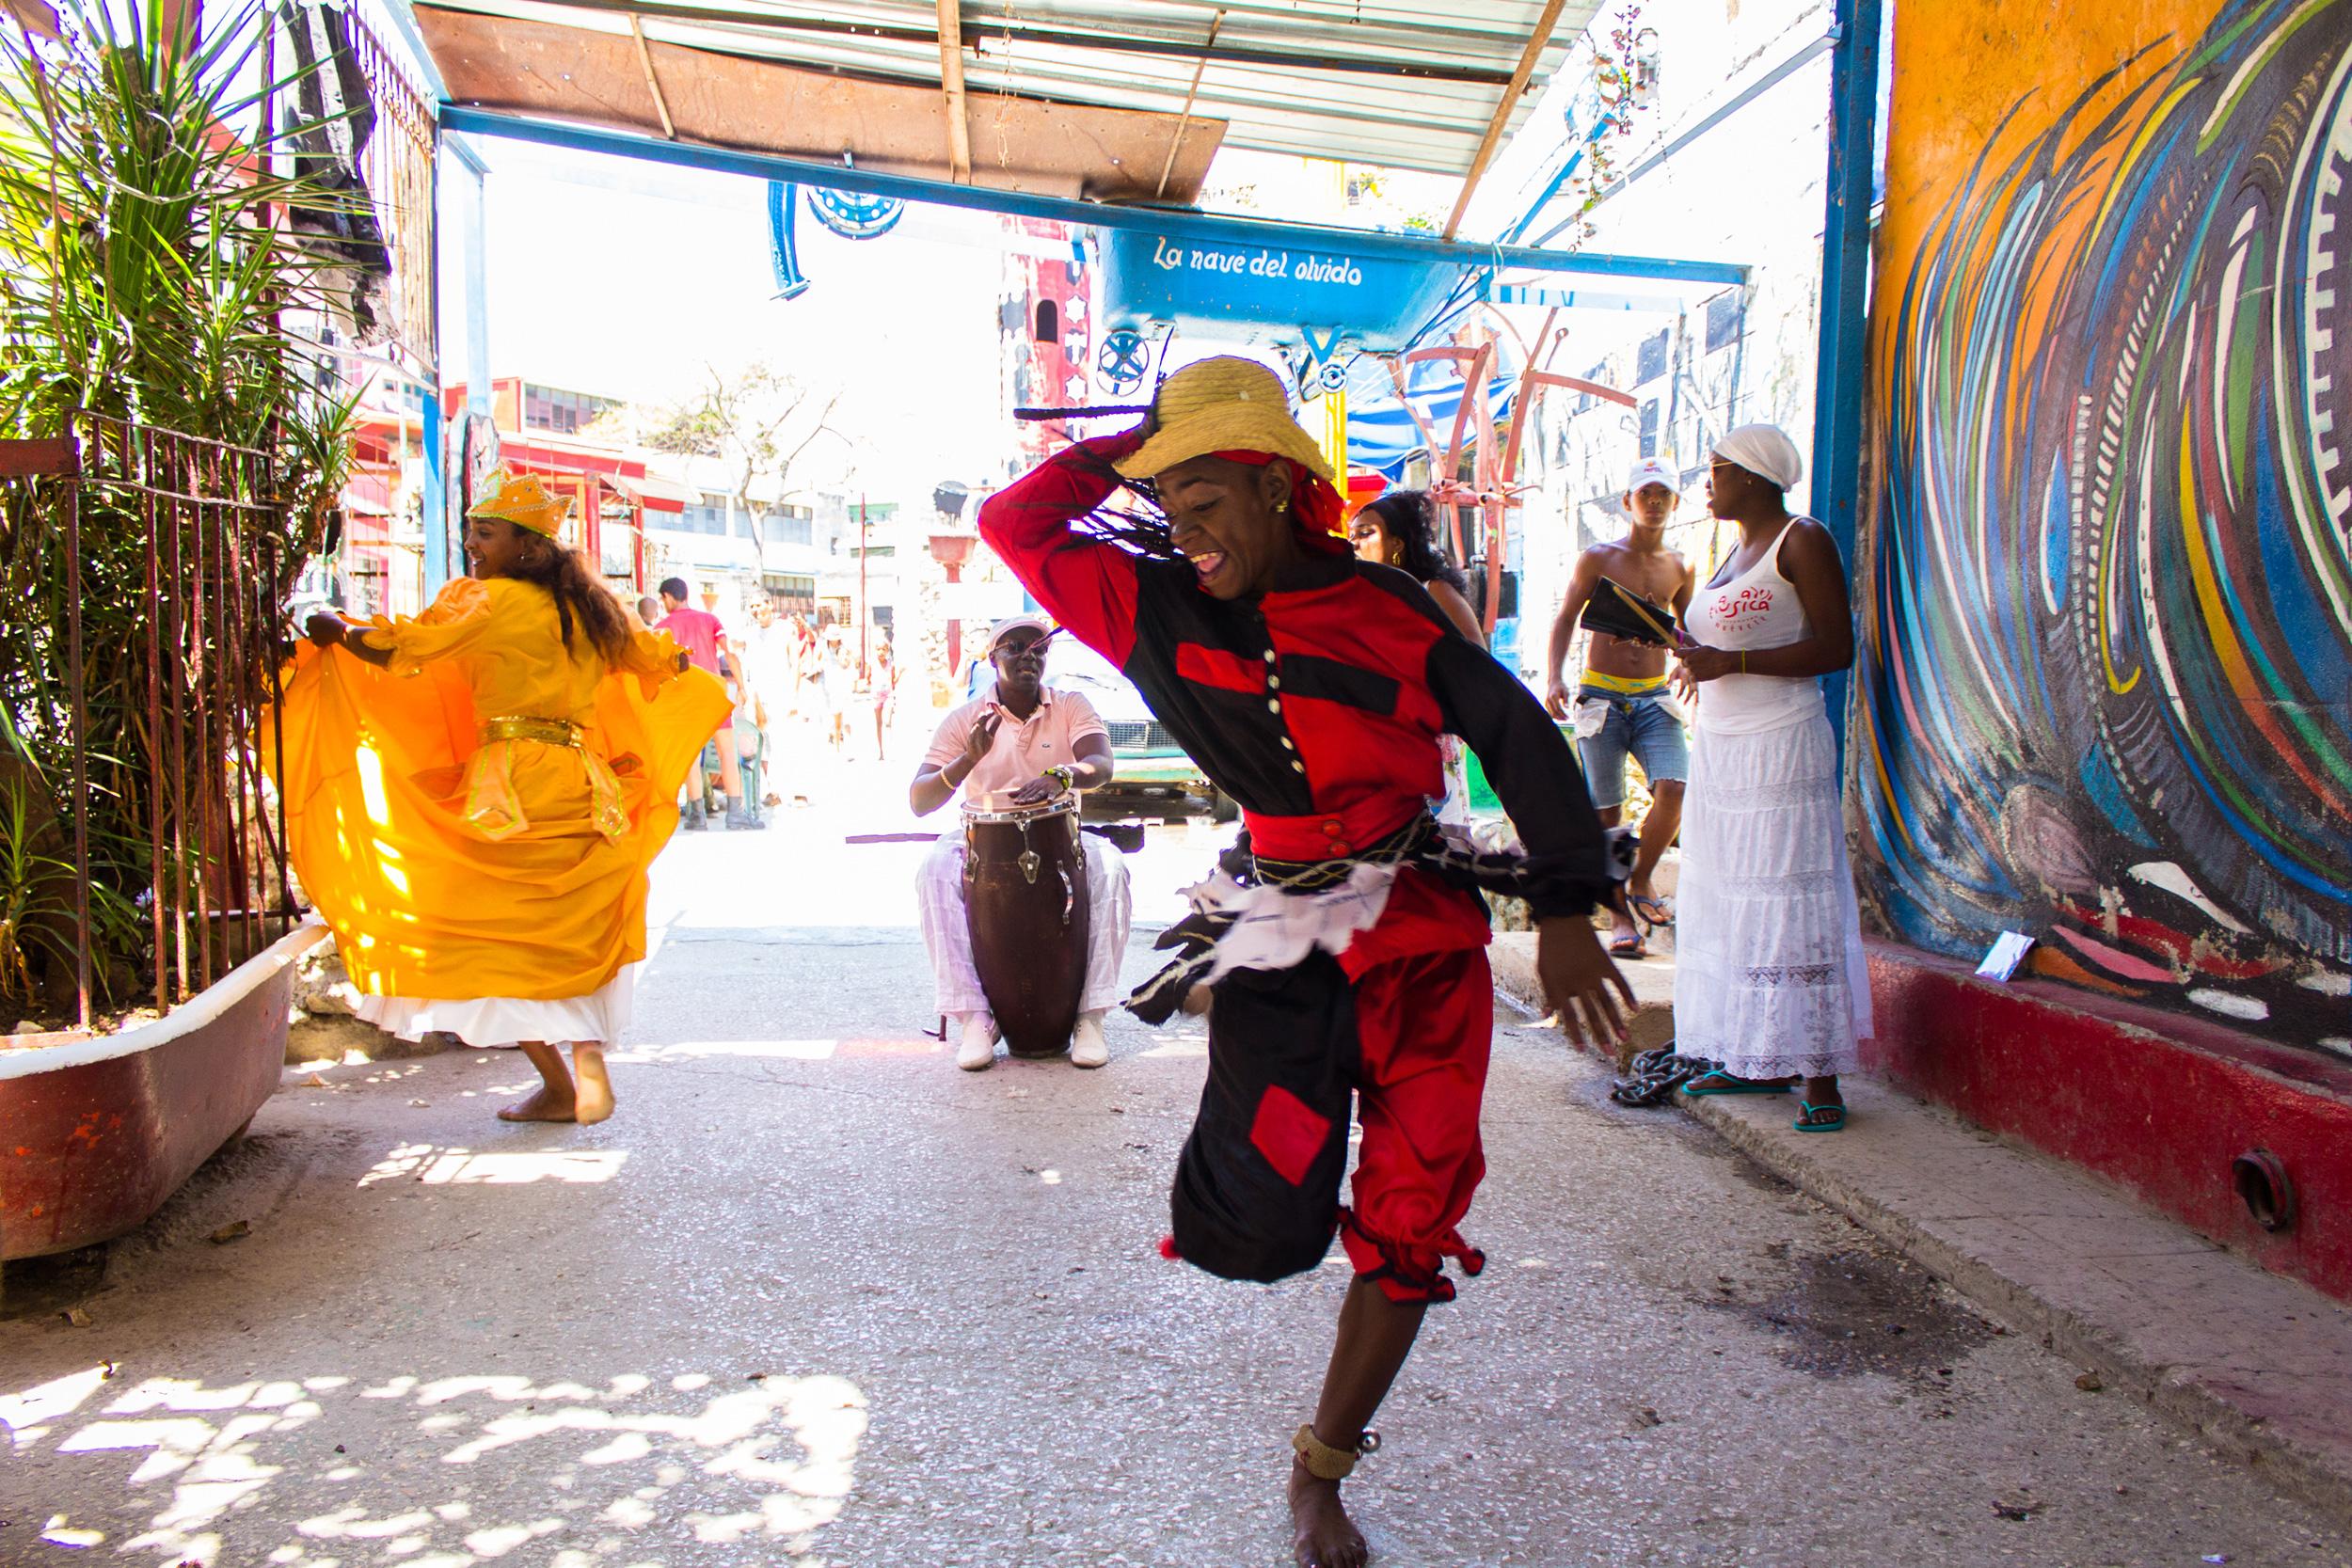 A folkloric Orisha dance performance for tourists in Havana, Cuba. Here at the front Echú-Elegguá (Yorùbá:Èṣù-Ẹlẹ́gbára), at the back in the yellow dress is Oricha Ochún (Yorùbá Ọ̀ṣun). Afro-Cuban culture is an important part of the tourism industry and very popular today.Photo  Marjon Melissen / CC BY-NC-ND 2.0